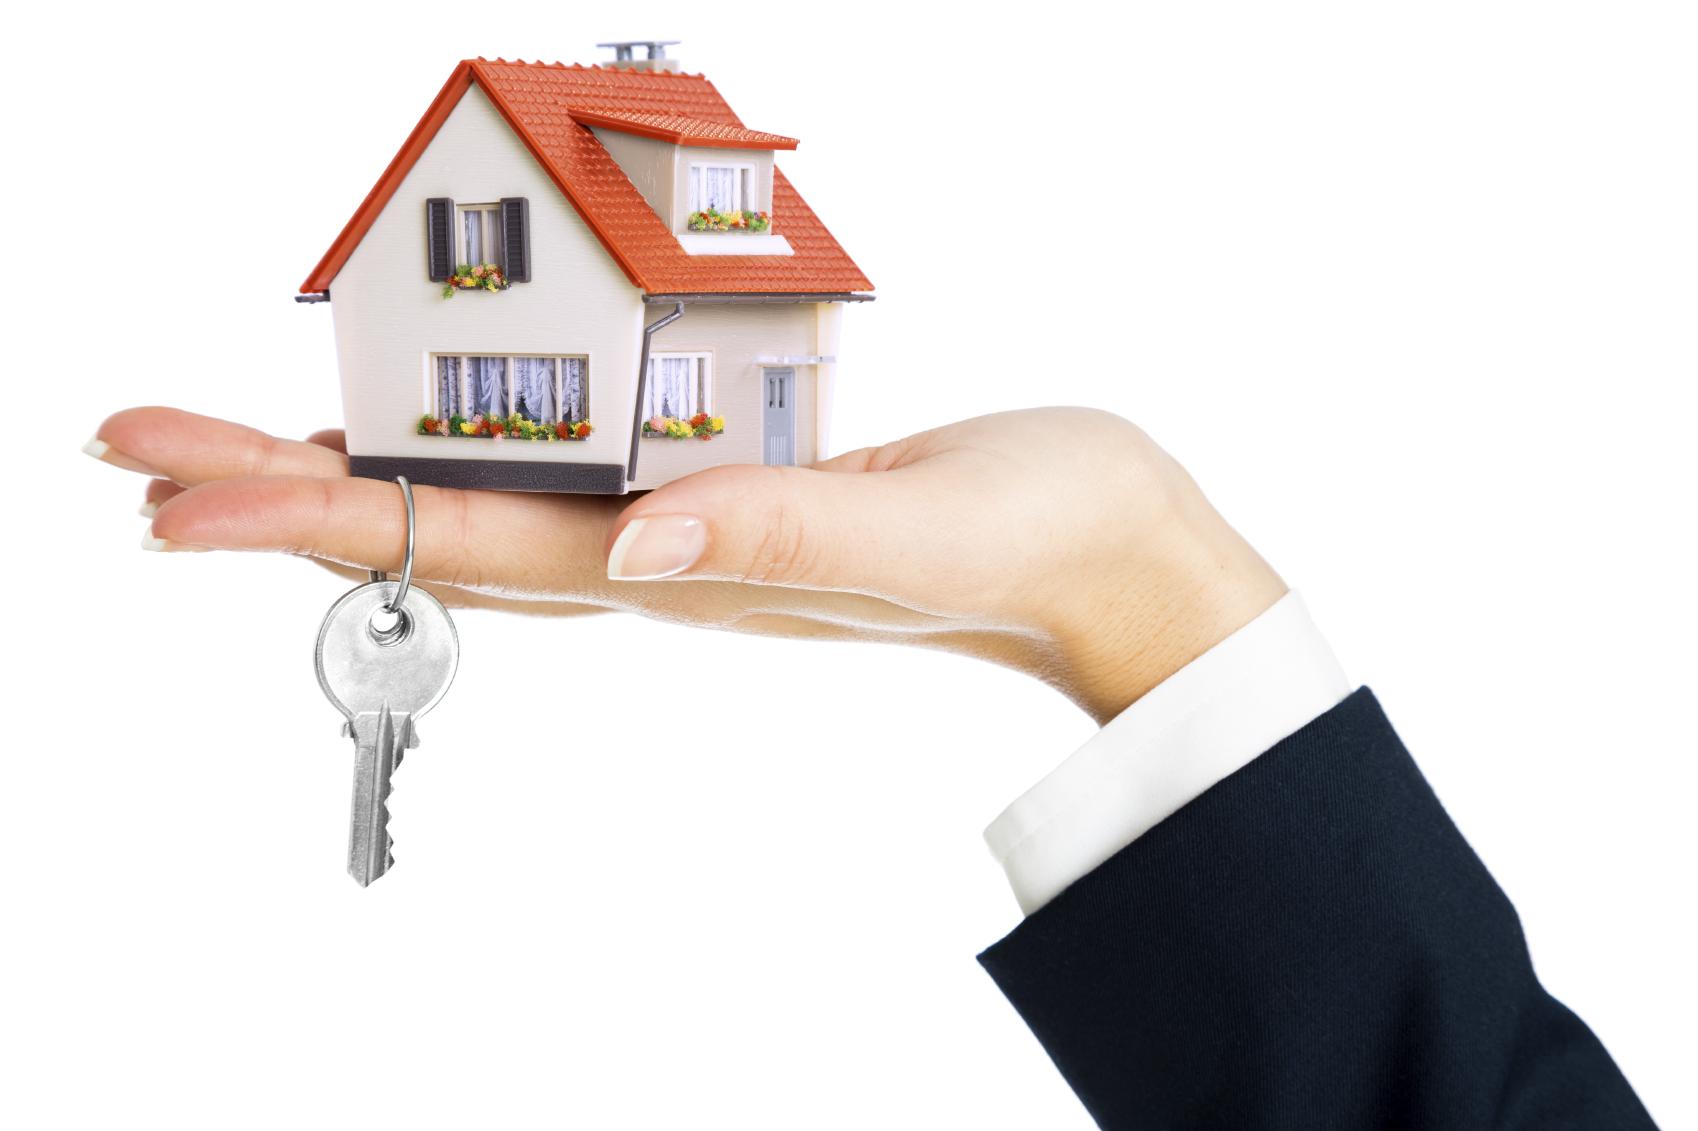 istock_000053672308_medium_(1)_landlords_page